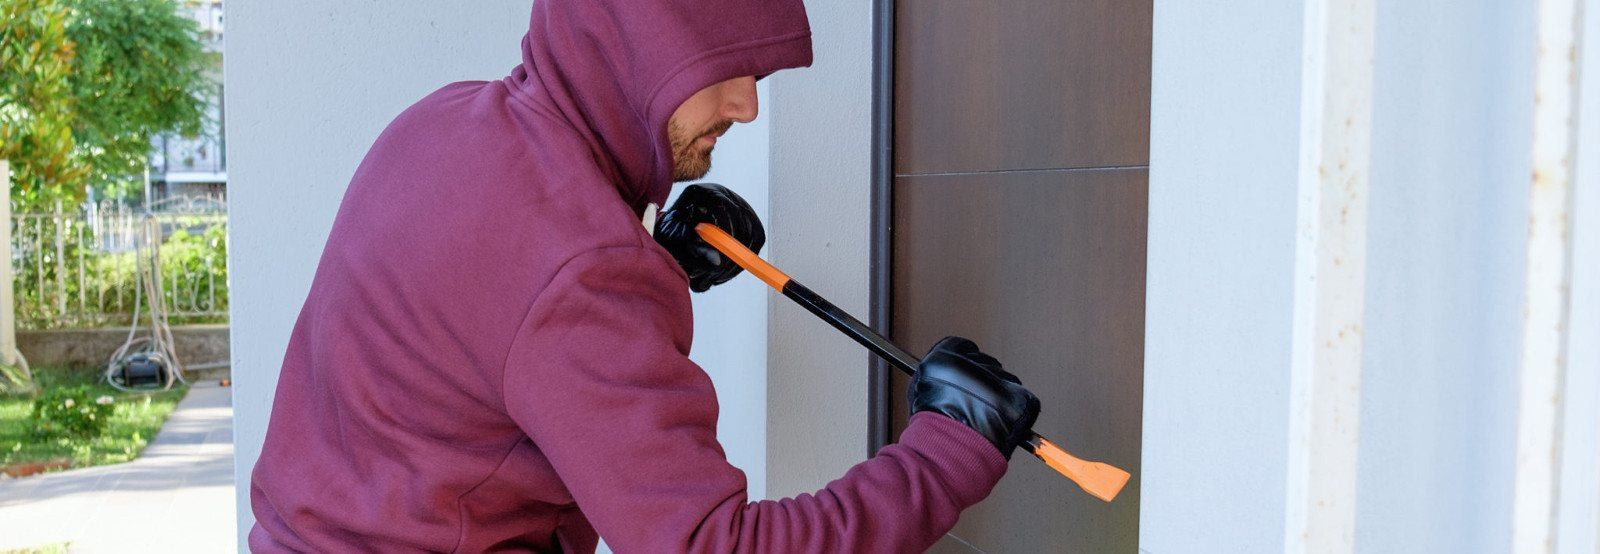 puertas antiokupa ladron hori - Presupuesto Puerta Anti okupas Precio